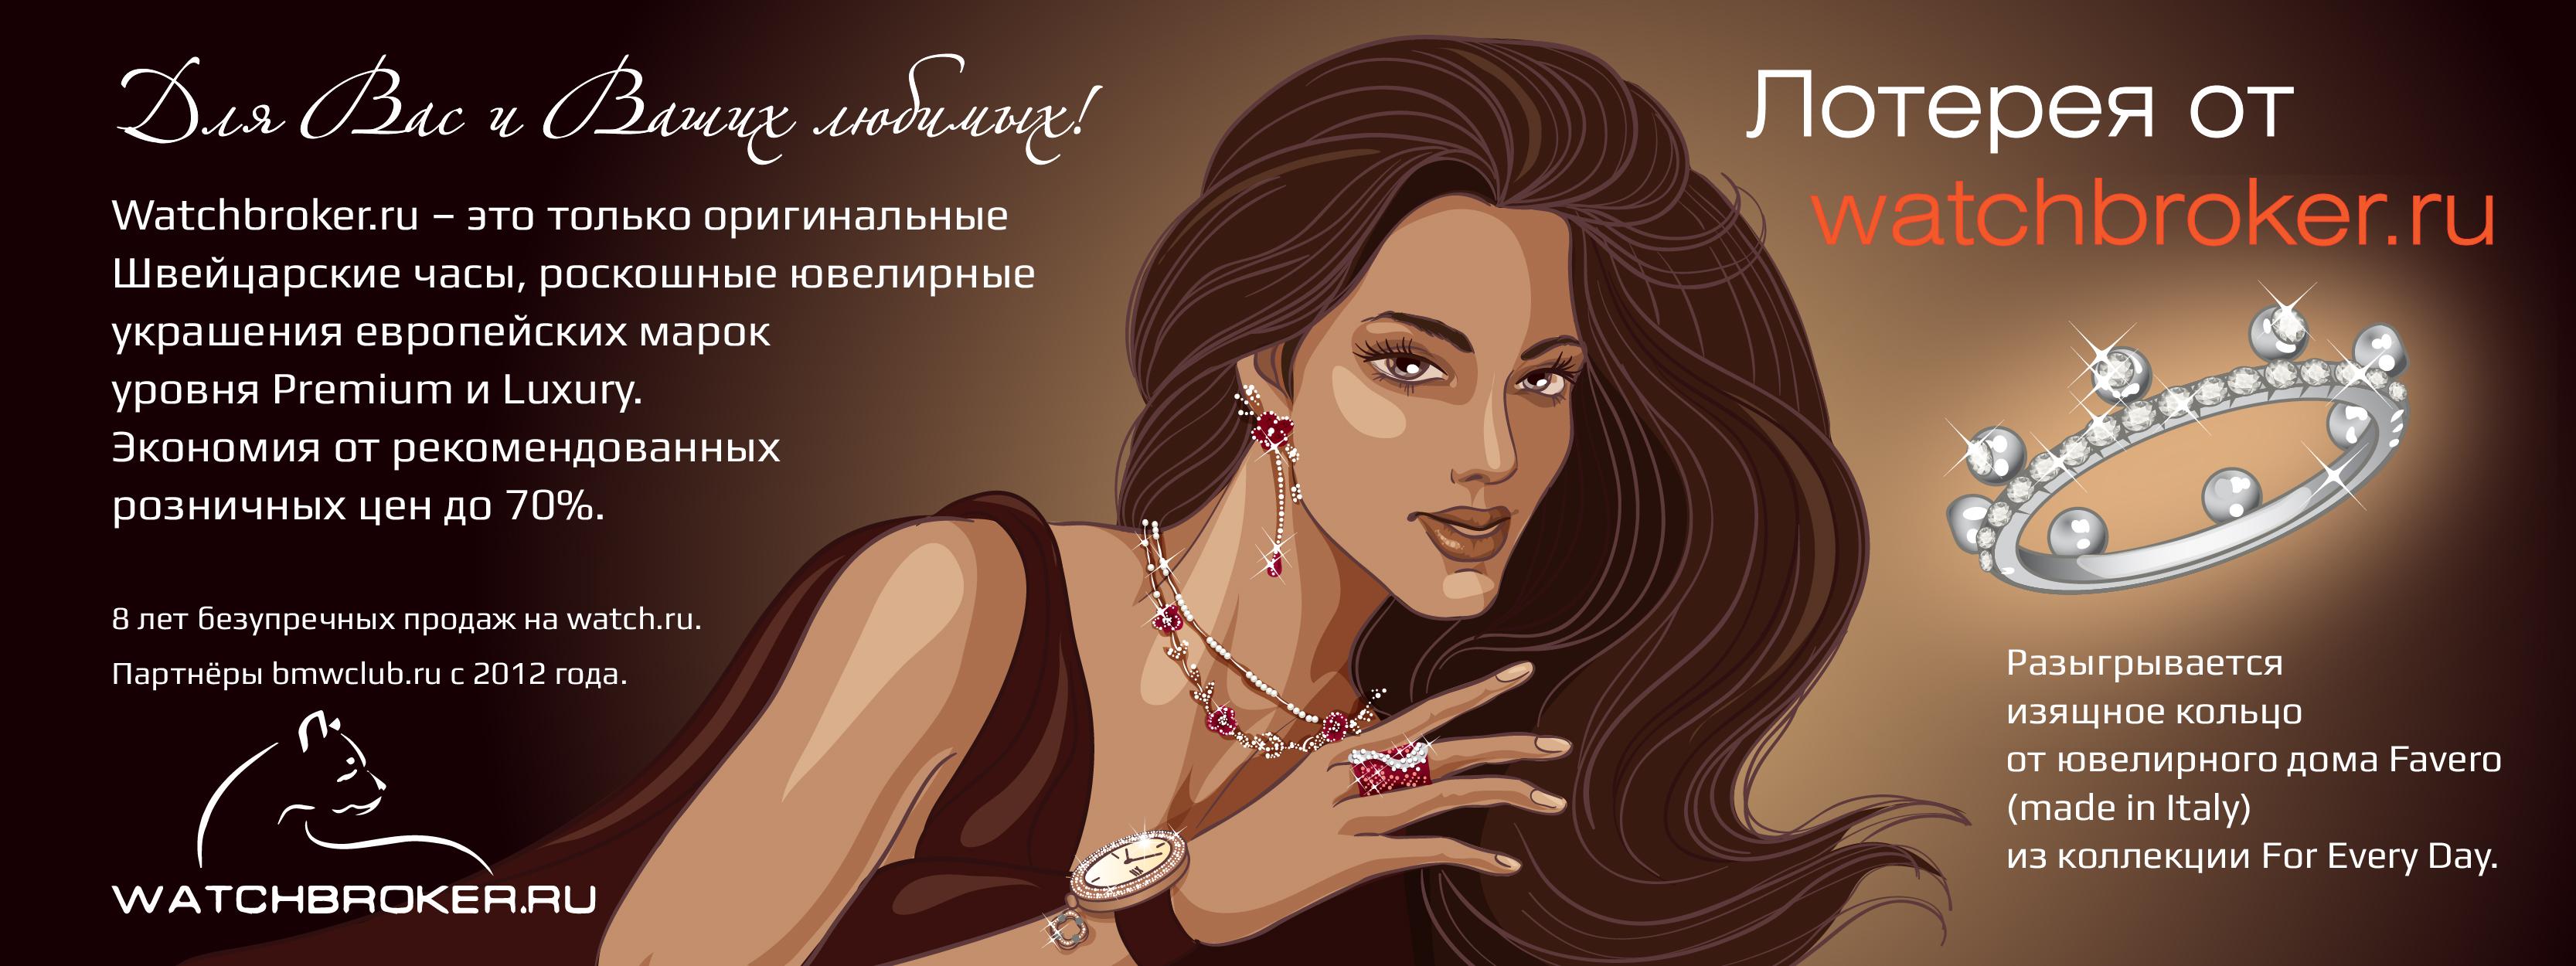 Banner_lotereya4-01